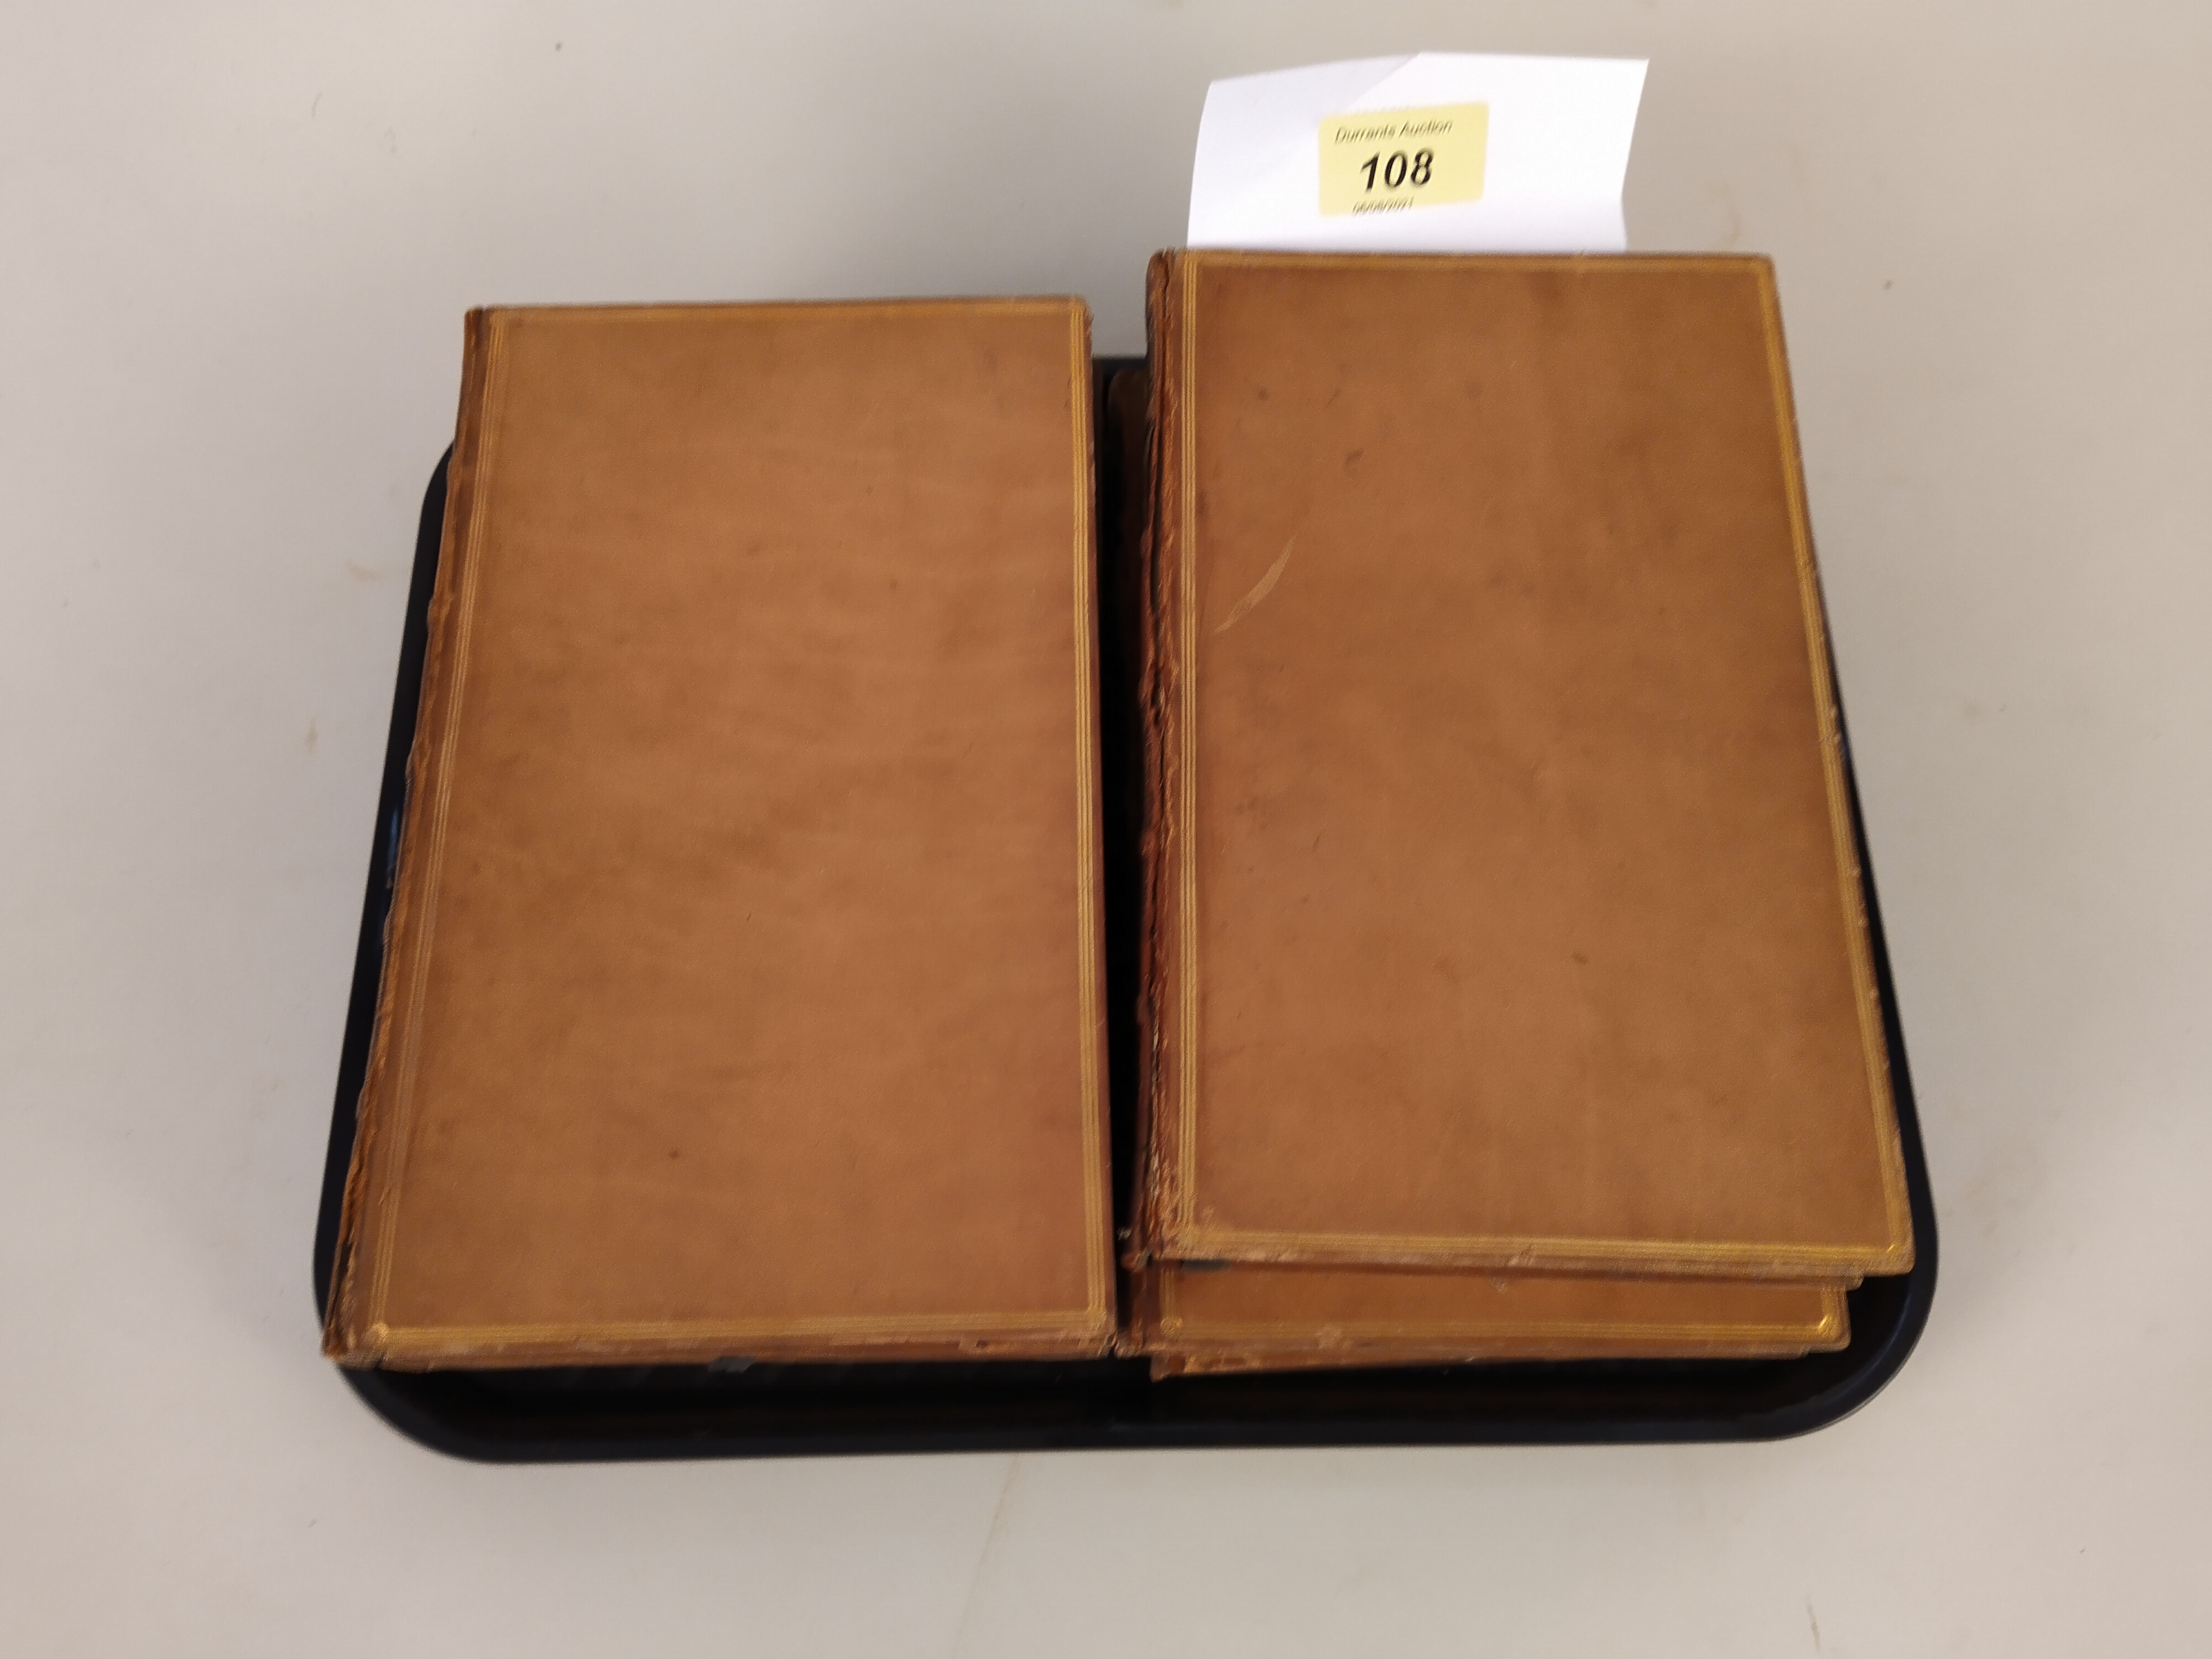 Memoirs of John, Duke of Marlborough by William Oxe, six volumes, Longman, Hurst, Rees, - Image 3 of 3